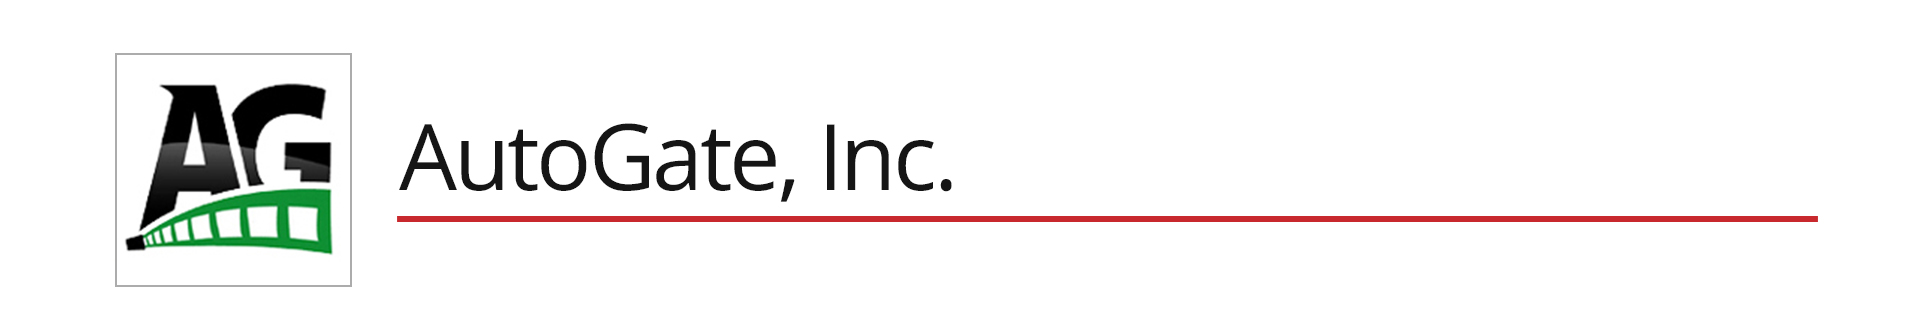 AutoGate,-Inc._CADBlock-Header.jpg